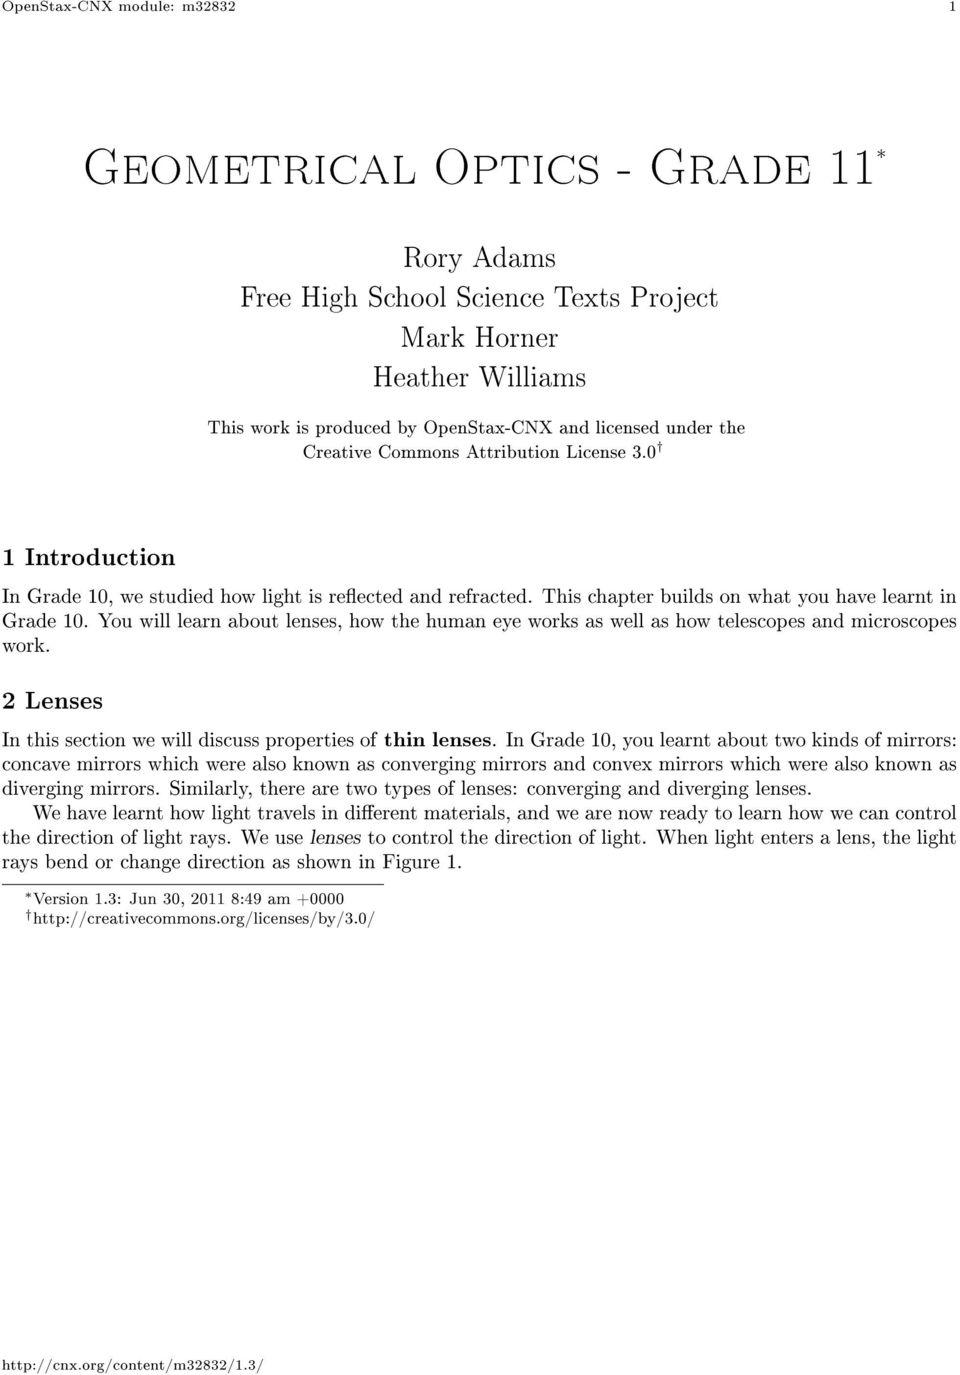 medium resolution of Geometrical Optics - Grade 11 - PDF Free Download